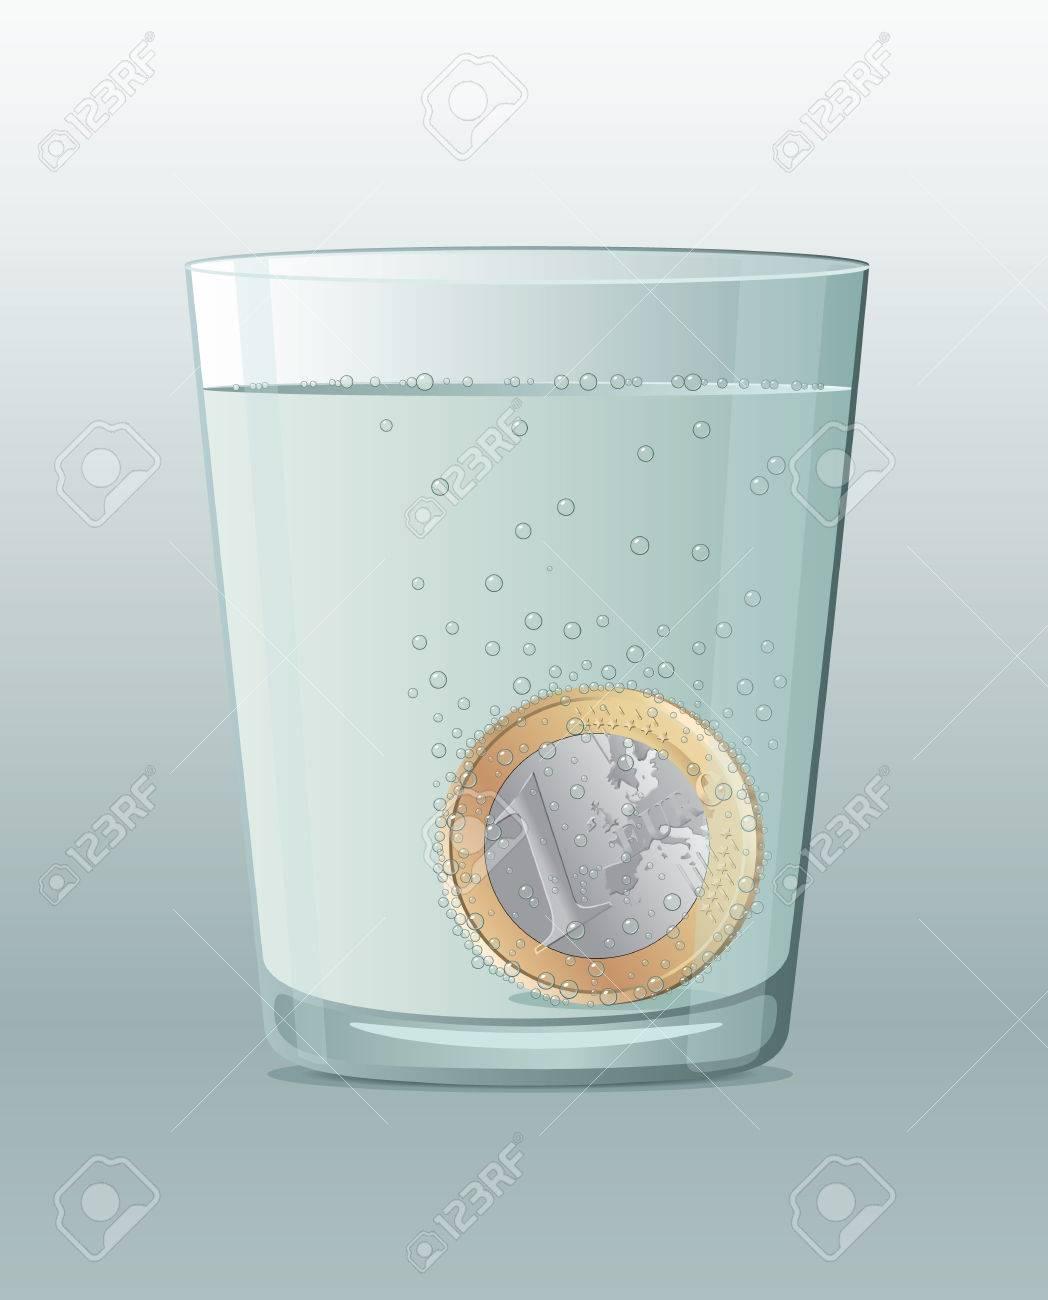 Aspirin-like Euro coin inside a glass of water - 27772930